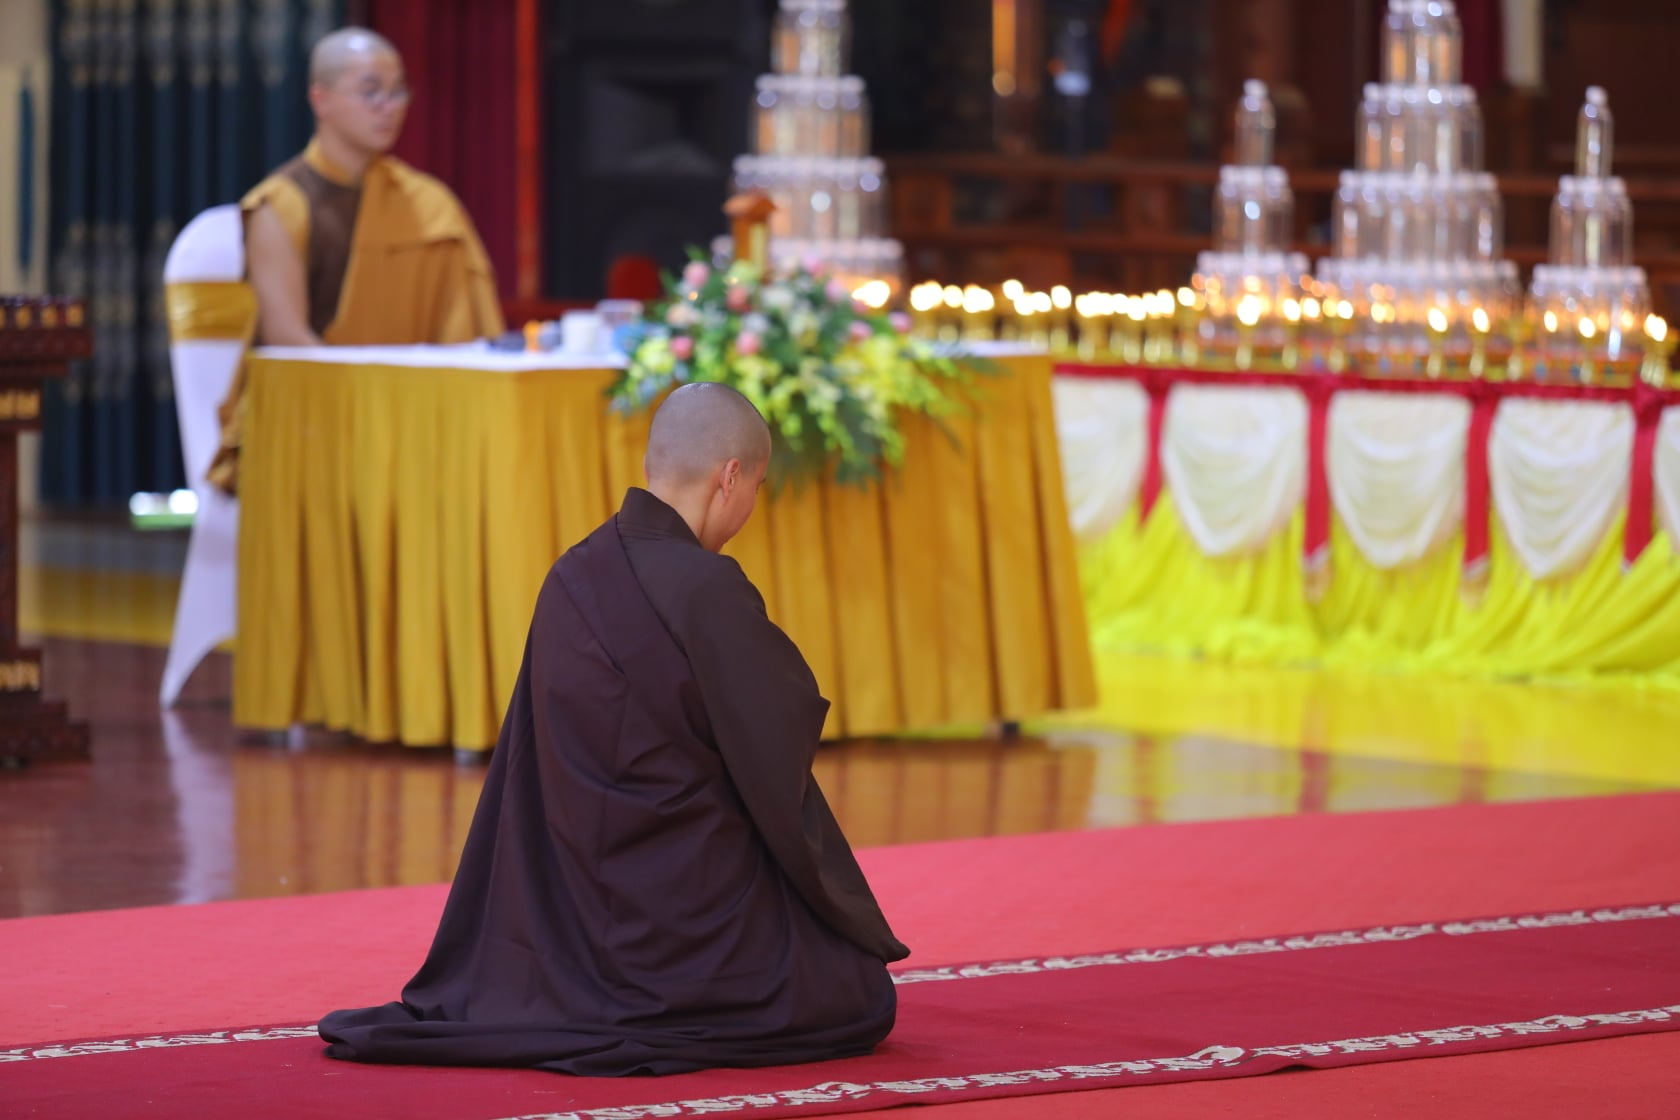 Thang Nghiem Dai Gioi Dan IV (52)